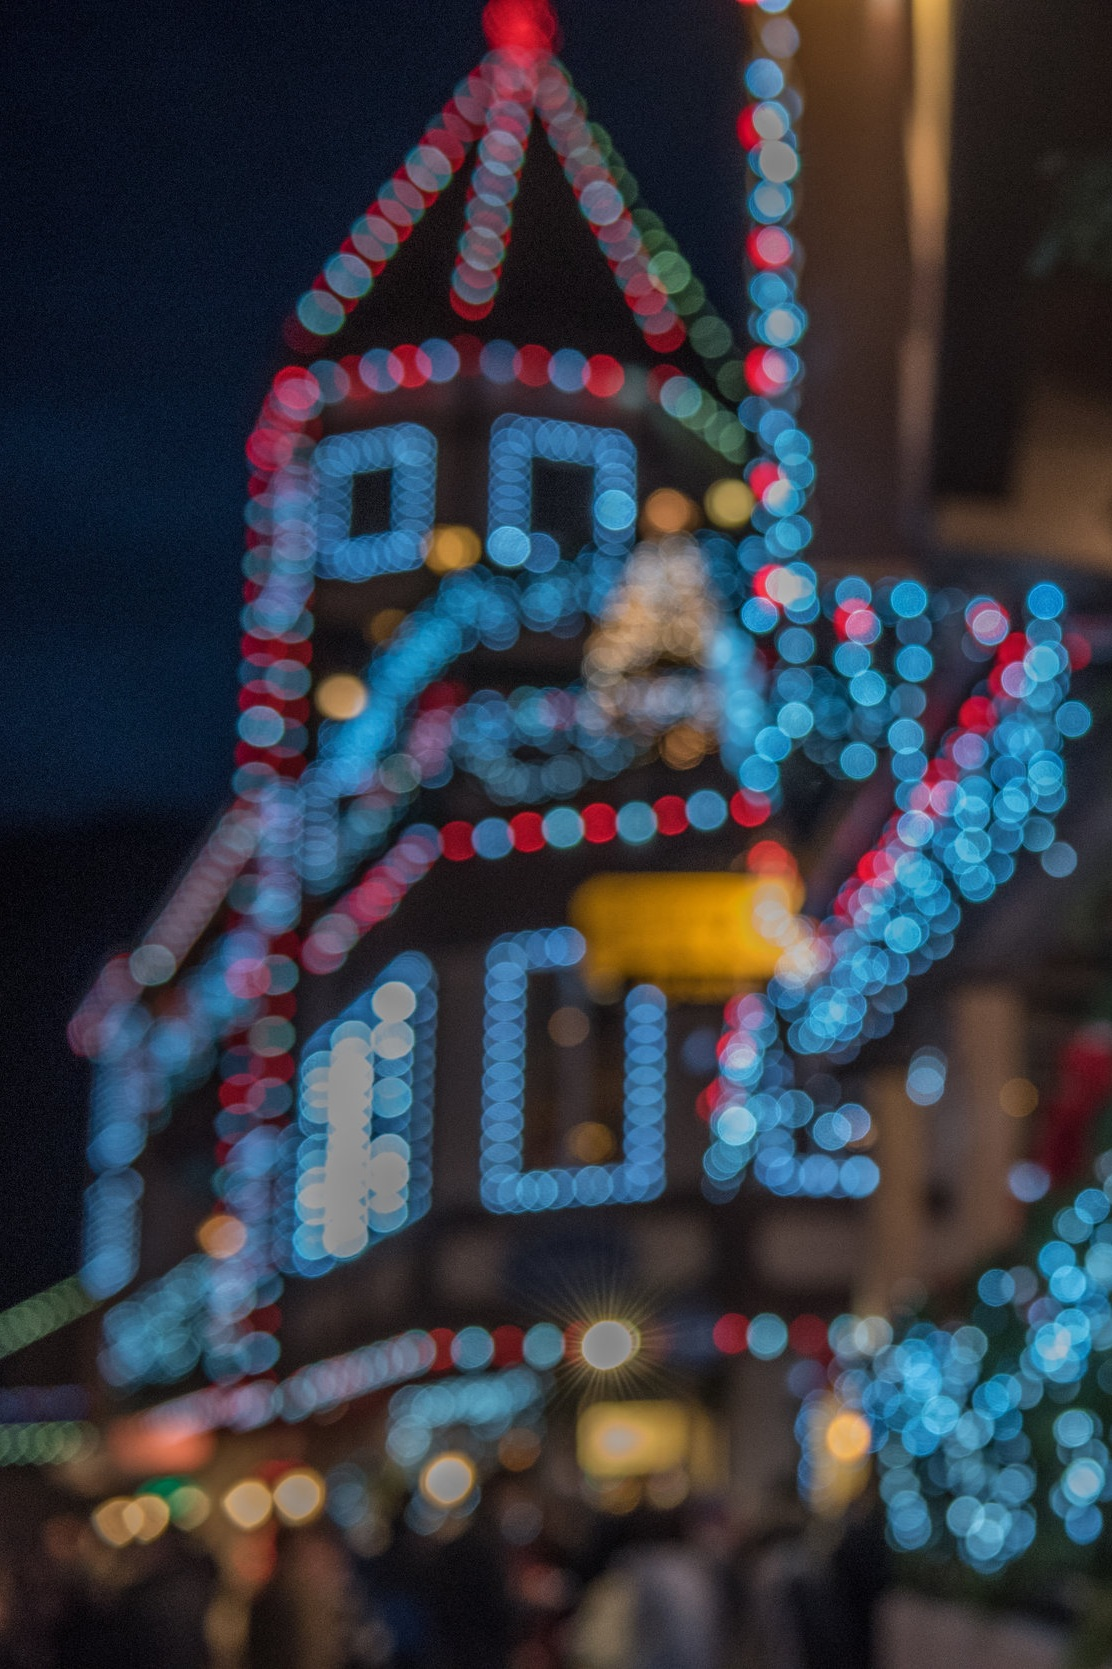 - VISIT LEAVENWORTH DURING CHRISTMAS TIME